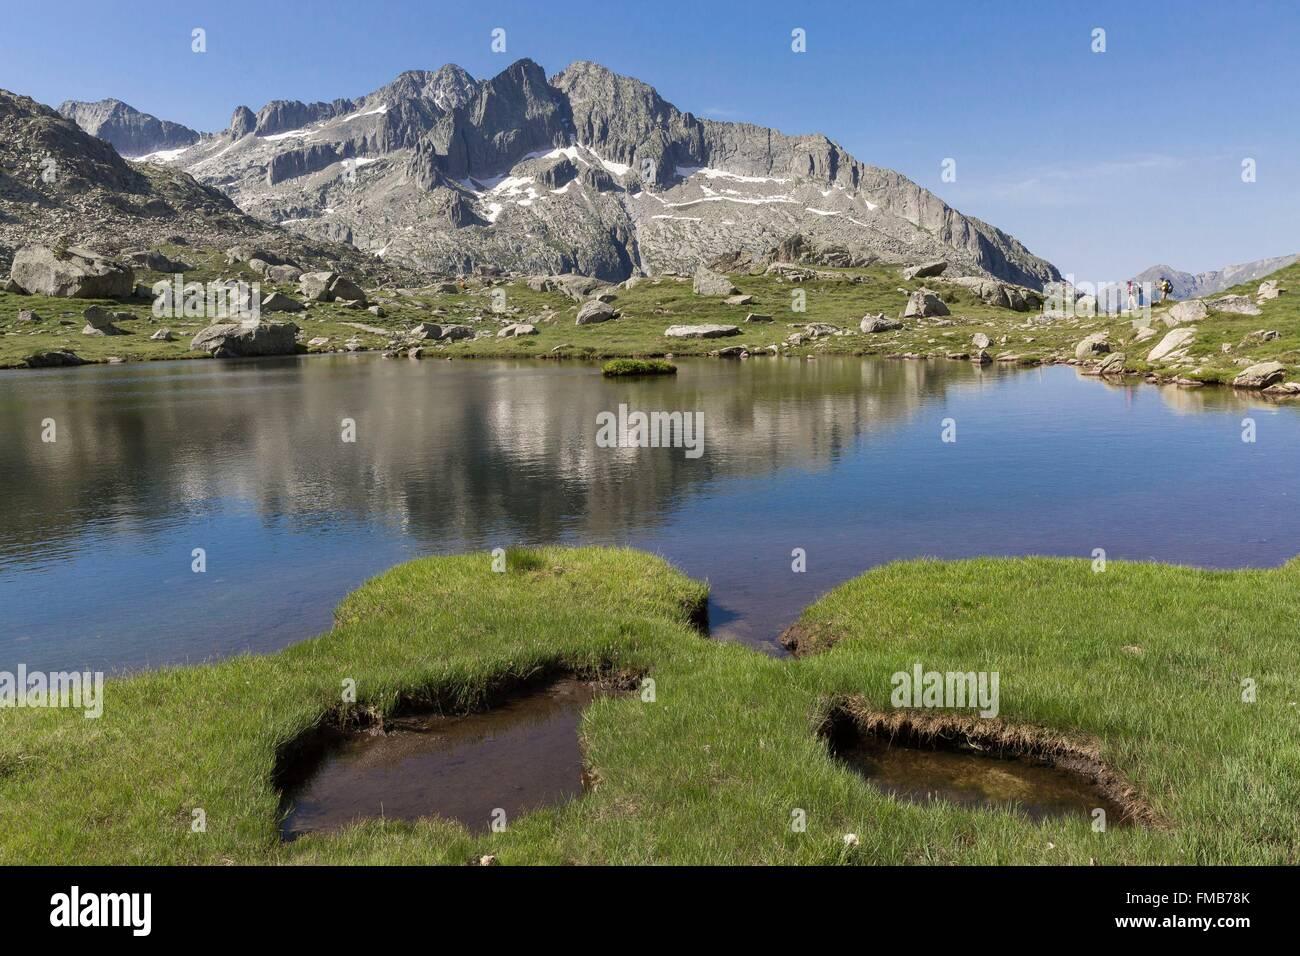 Spain, Catalonia, Val d'Aran, Arties, Aigüestortes i Estany de Sant Maurici National Park, between Monges - Stock Image